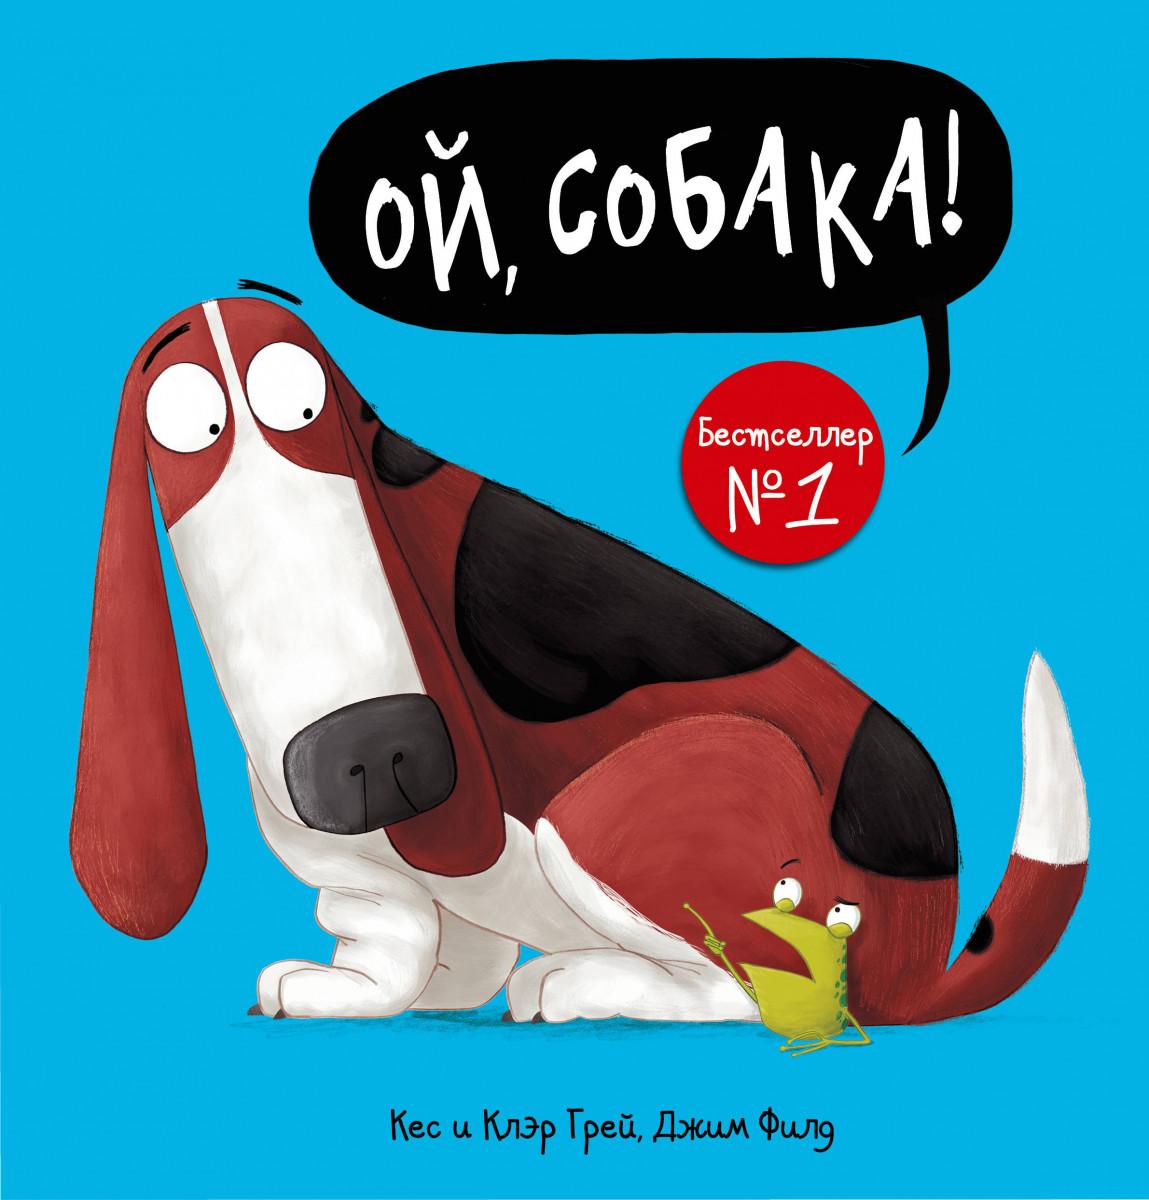 Ой, собака!